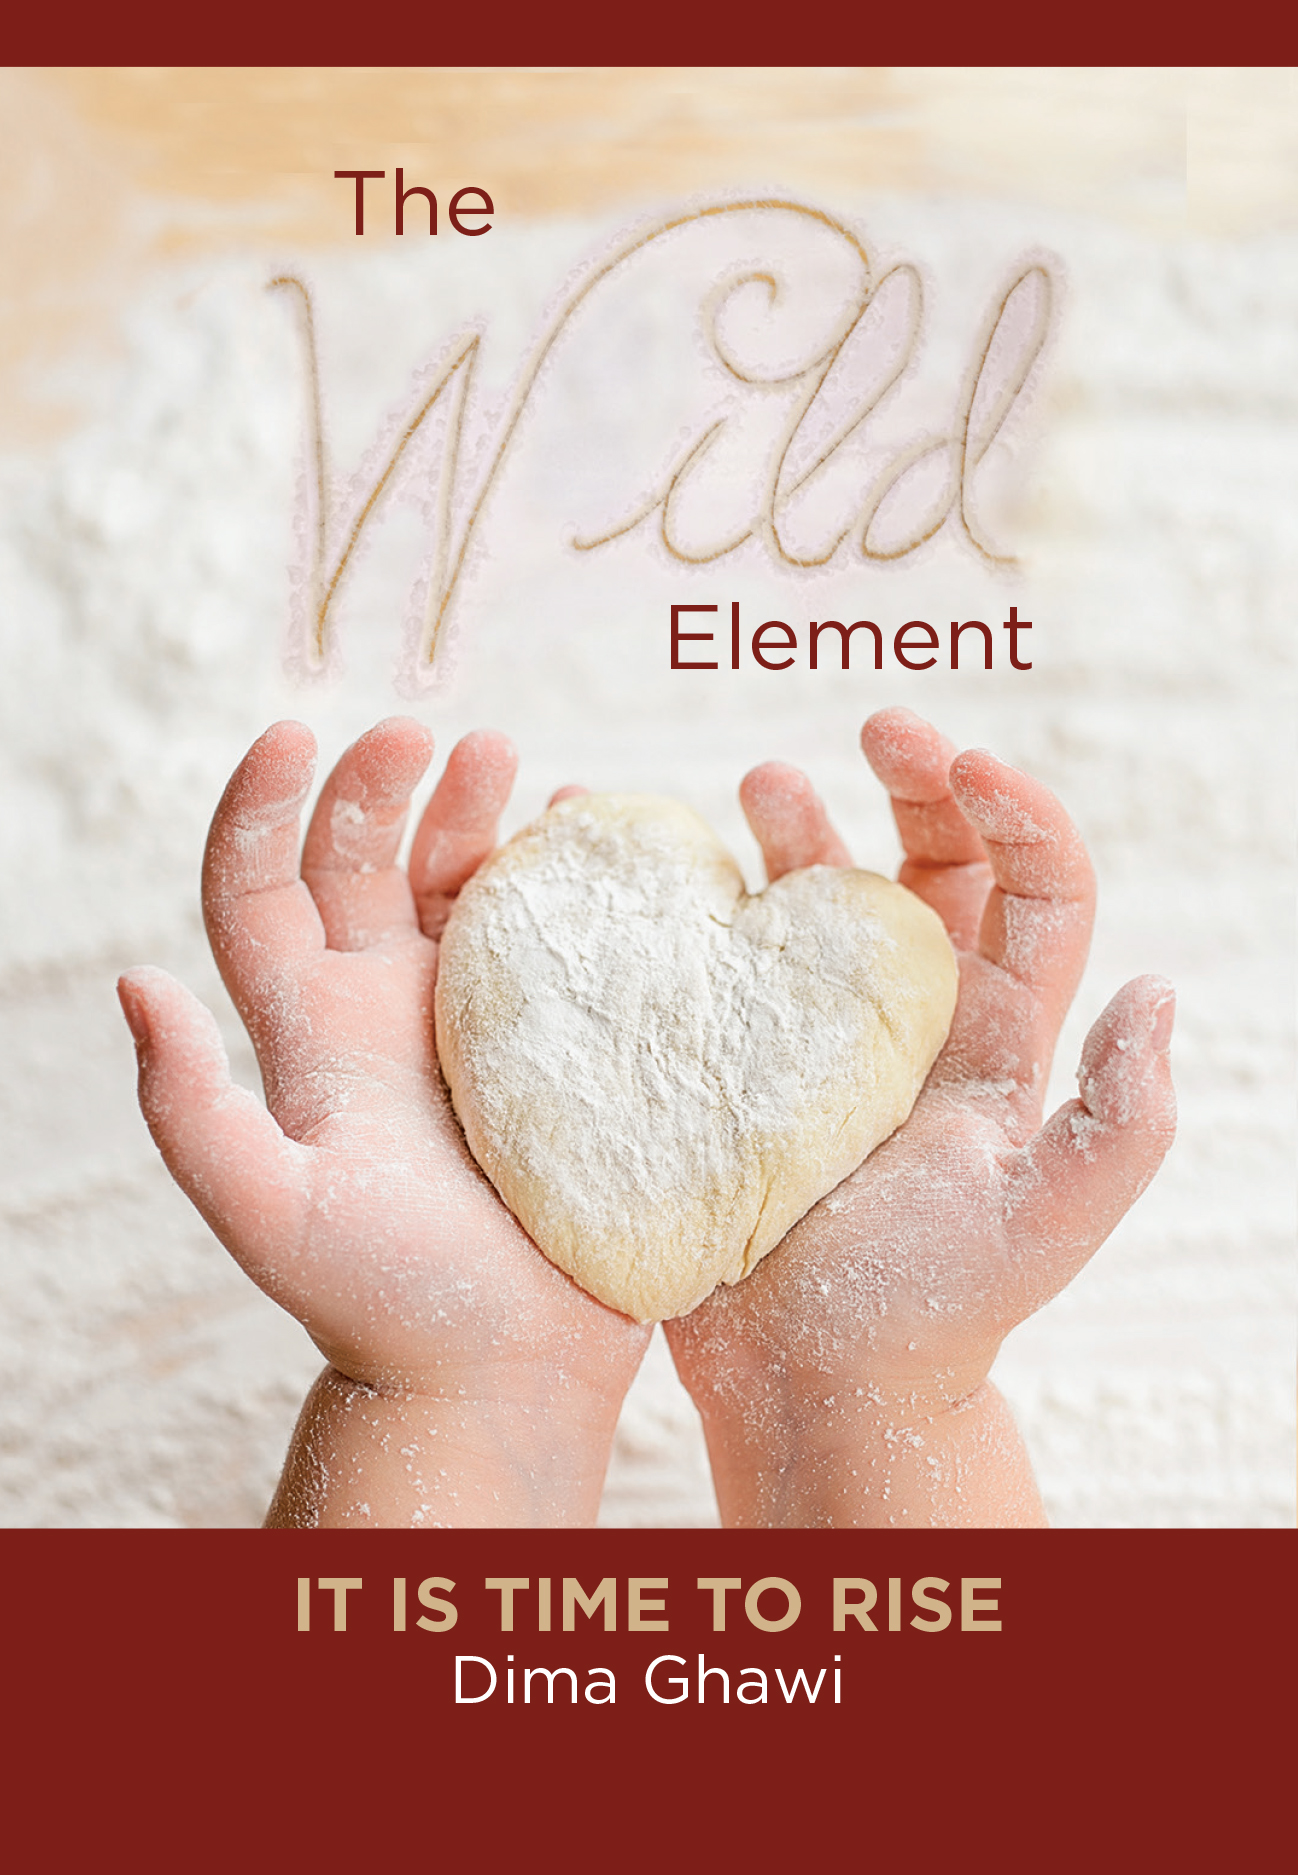 The Wild Element